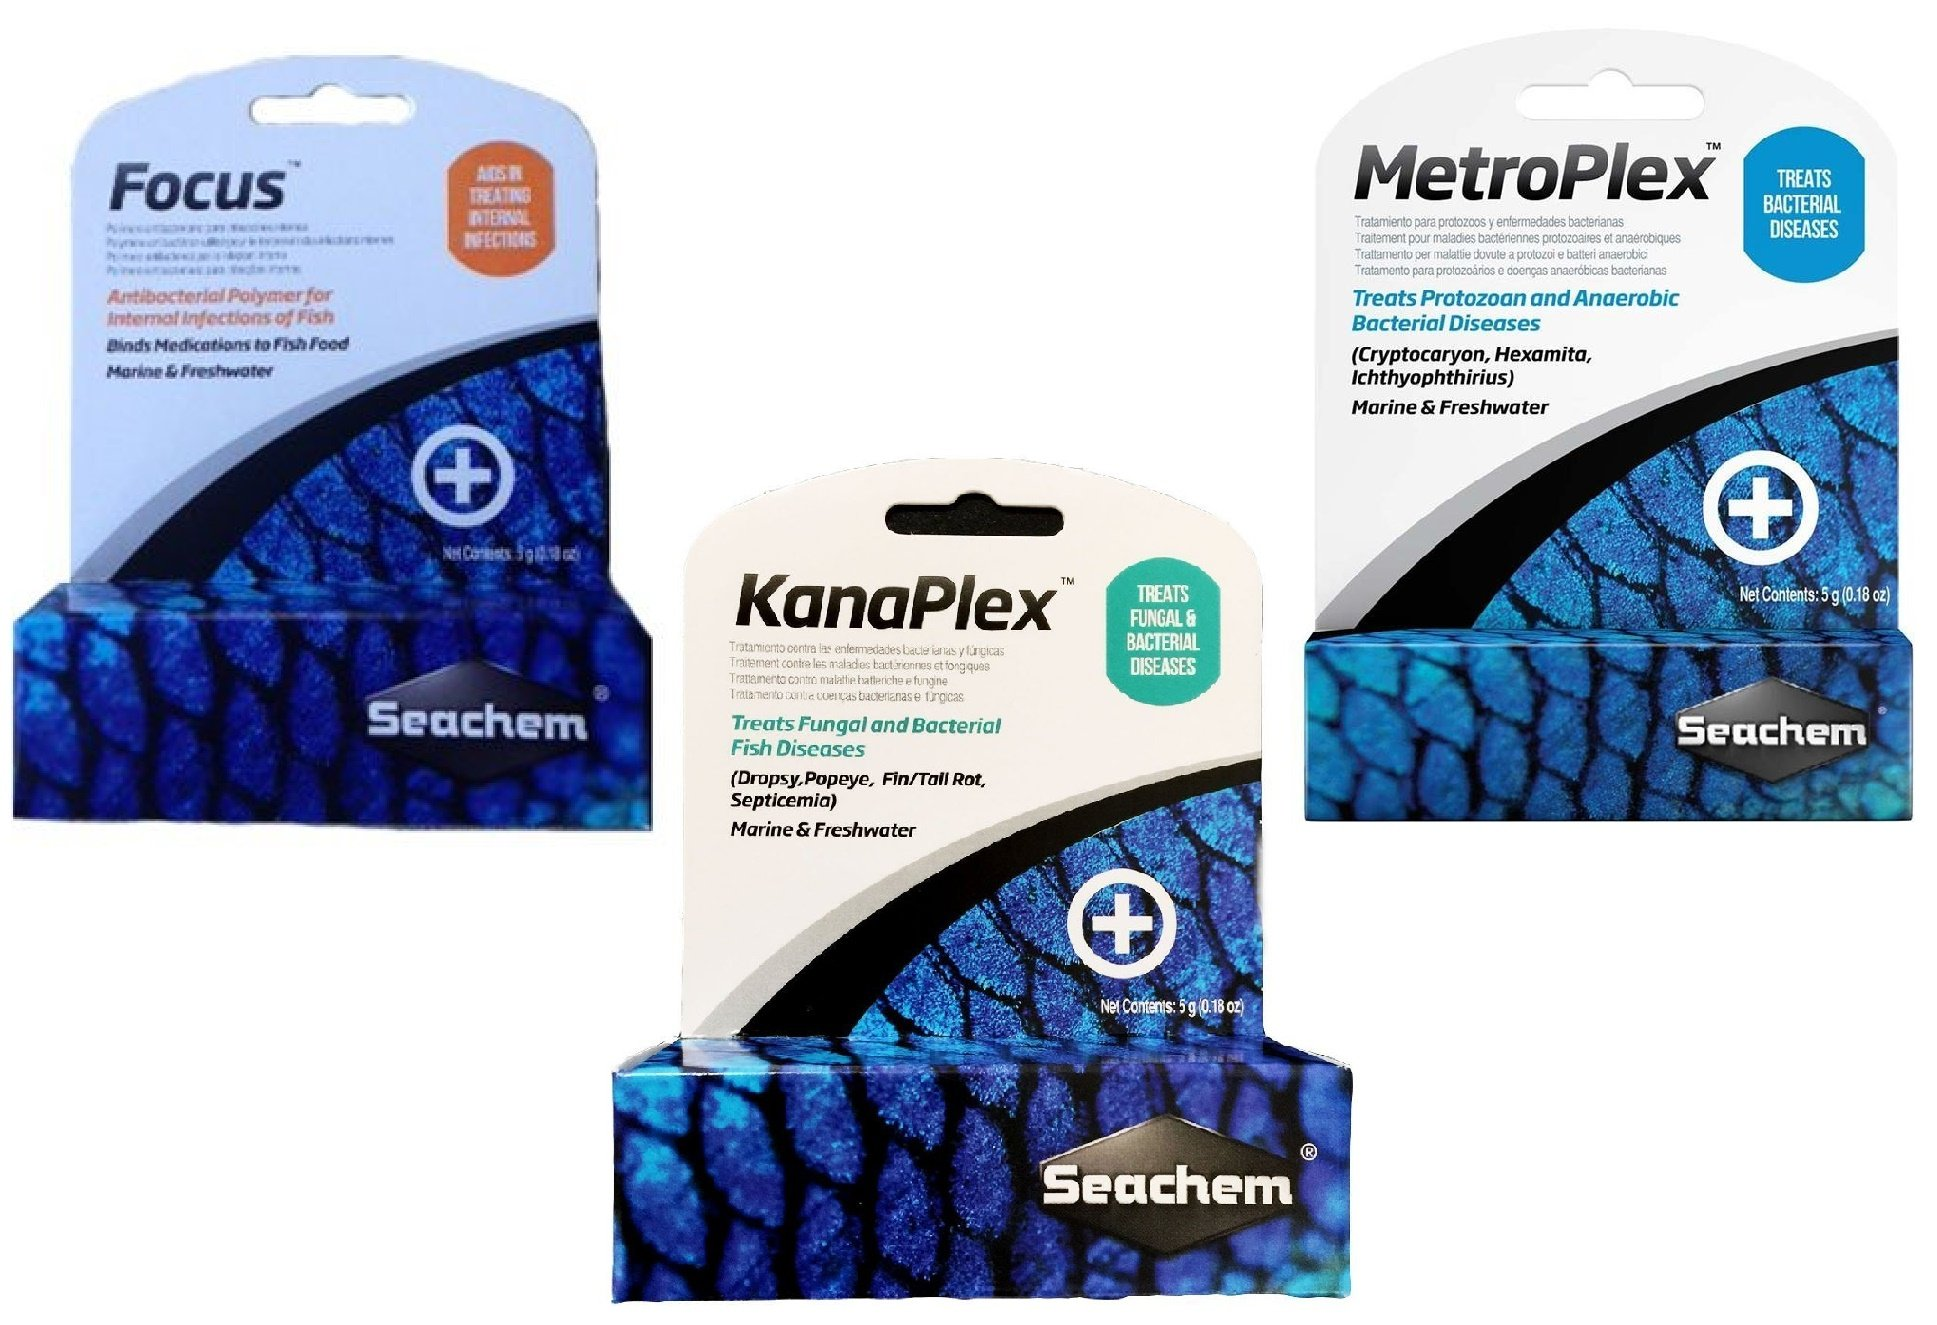 Seachem 3 Piece Treatment Kit, 1-Focus, 1-Metroplex, and 1-Kanaplex (5 Grams Each)